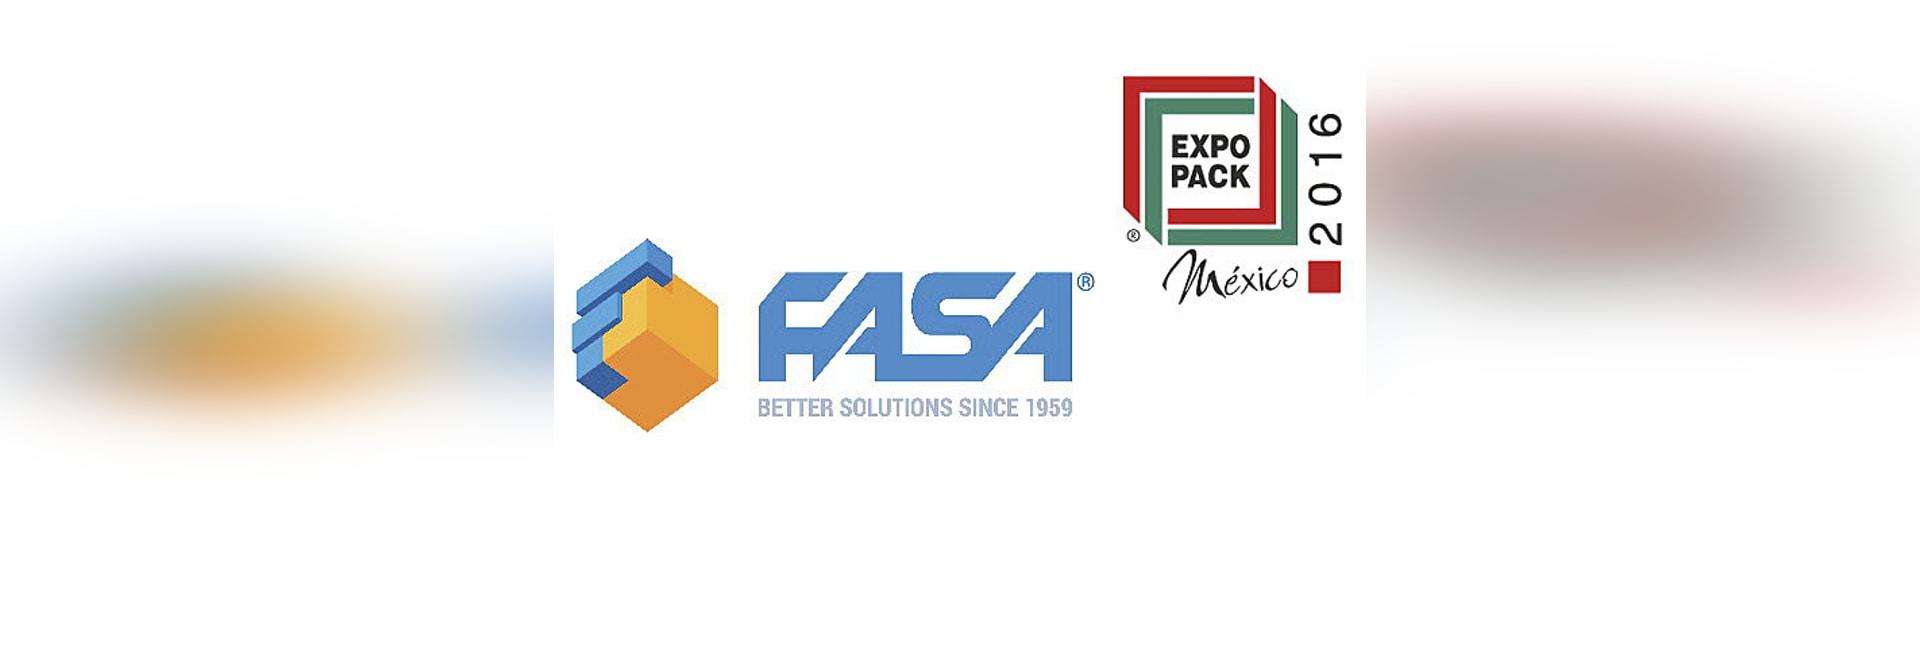 Invitation to meet FASA at EXPO PACK 2016